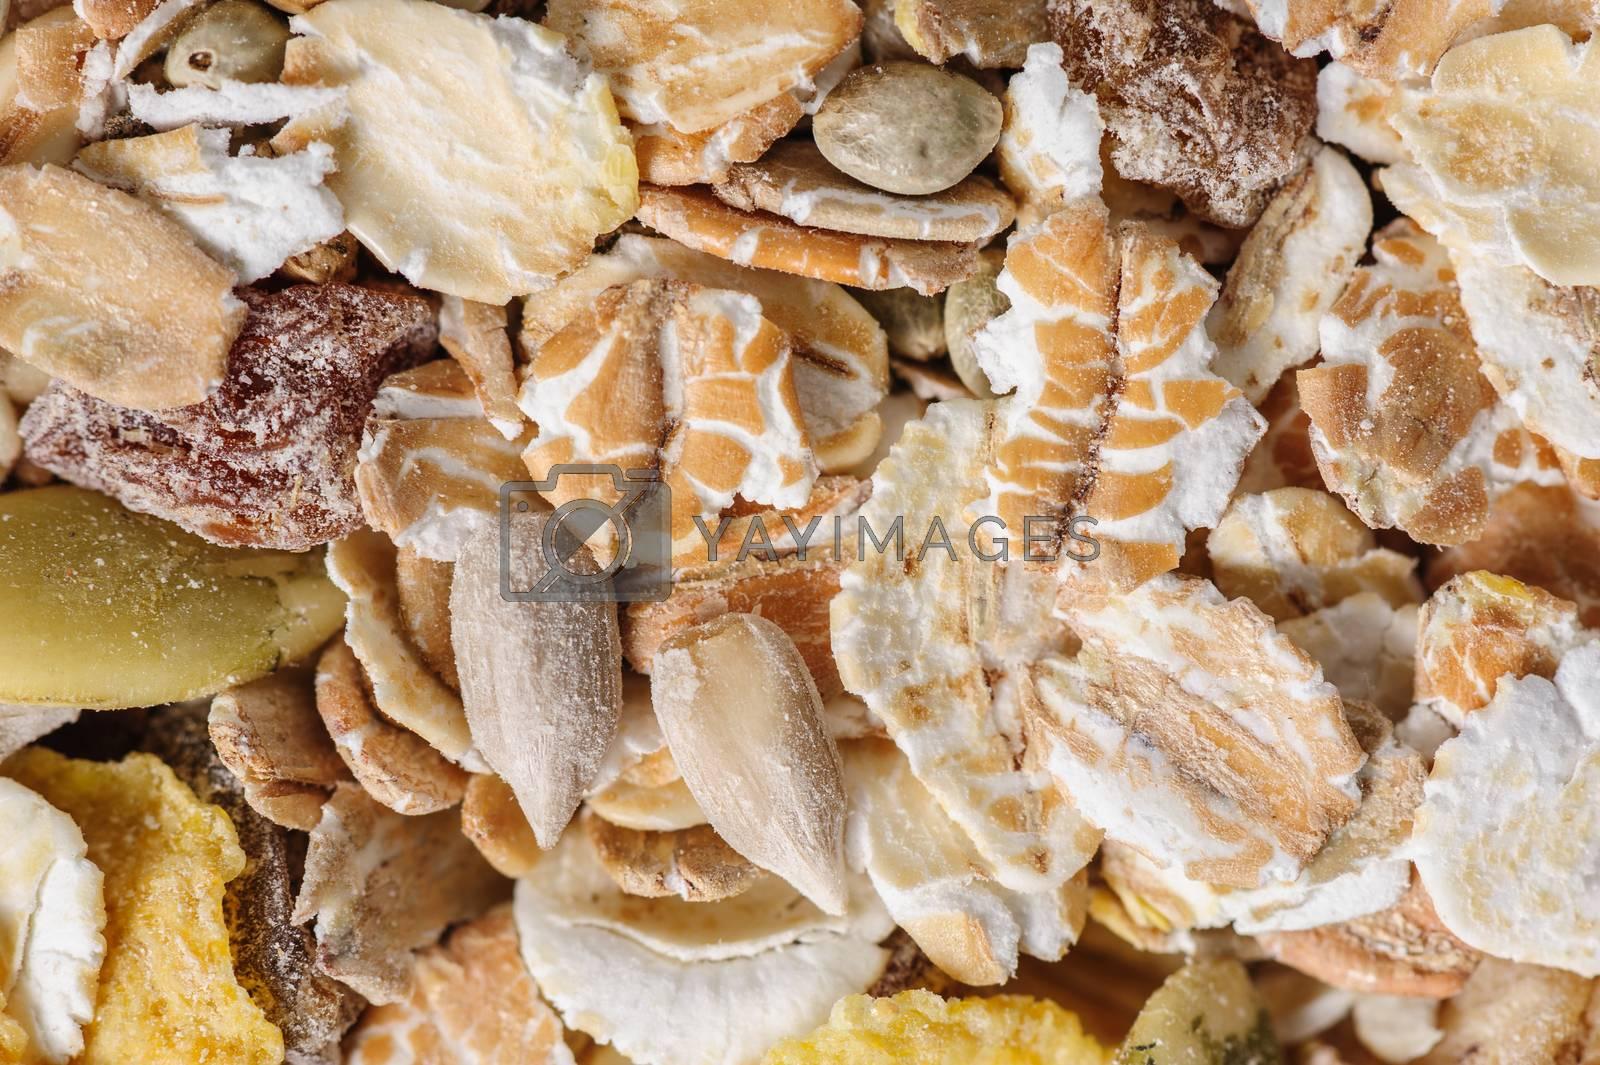 Dry muesli macro closeup shot from above, good as background